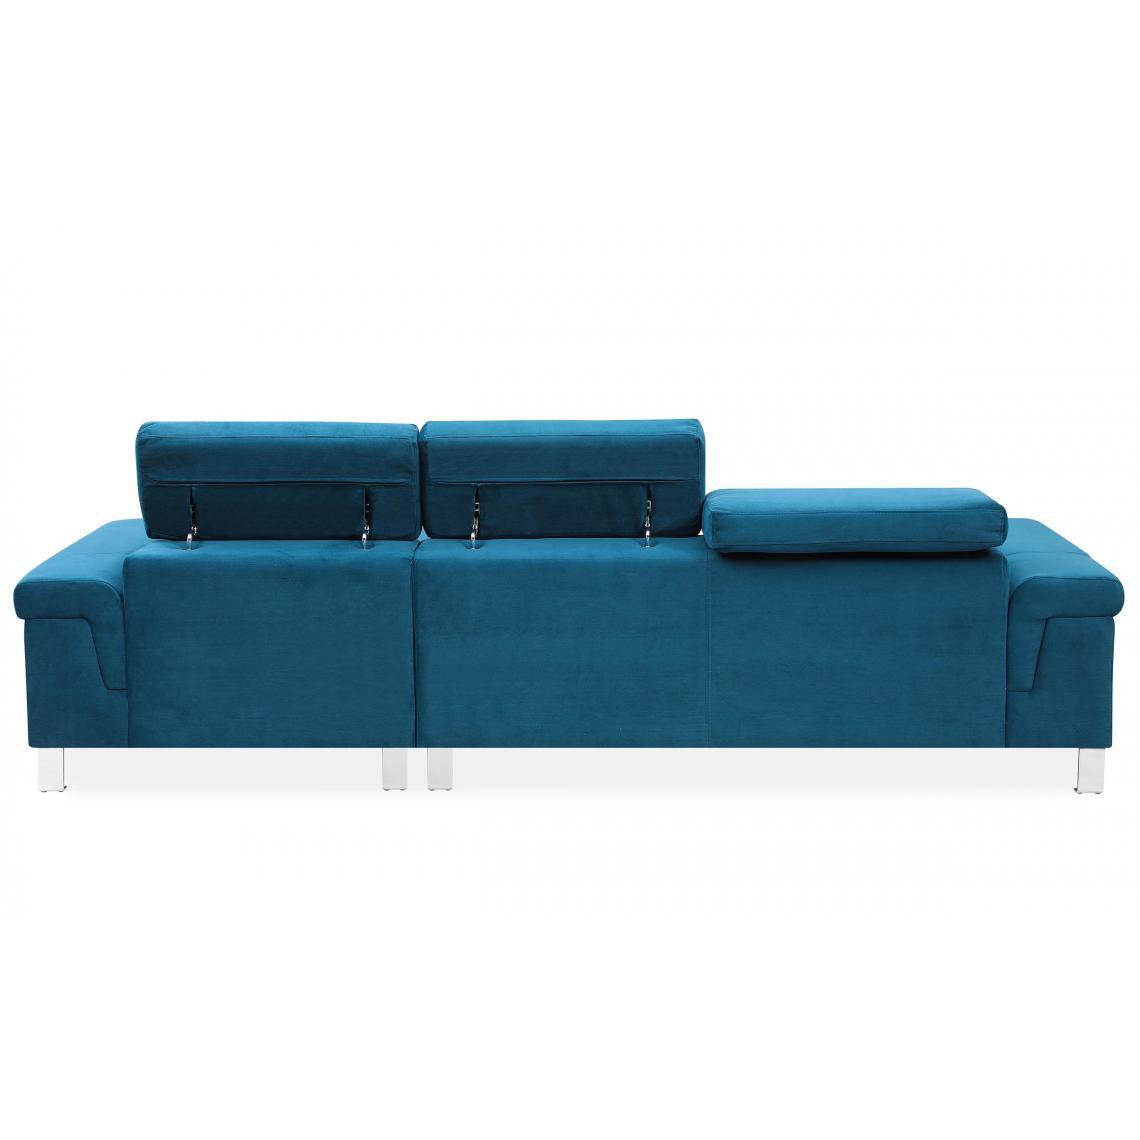 Canapé d'angle en velours Bleu IRINA pVwZ2